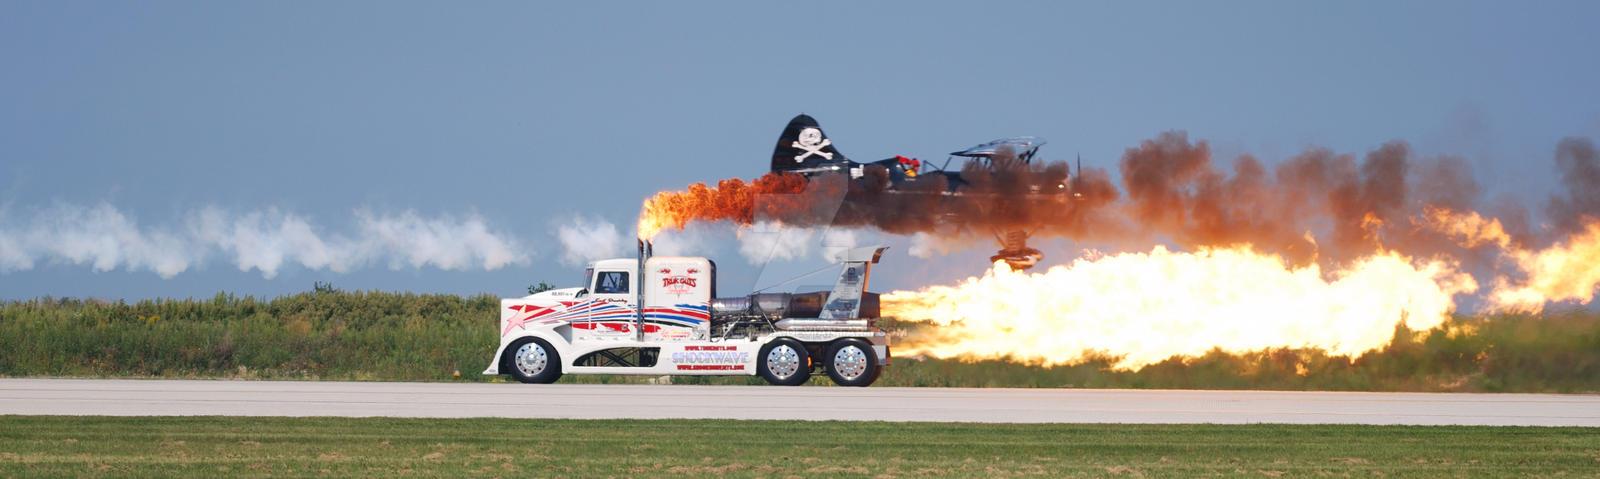 Shockwave Jet Truck 2 by GTX-Media